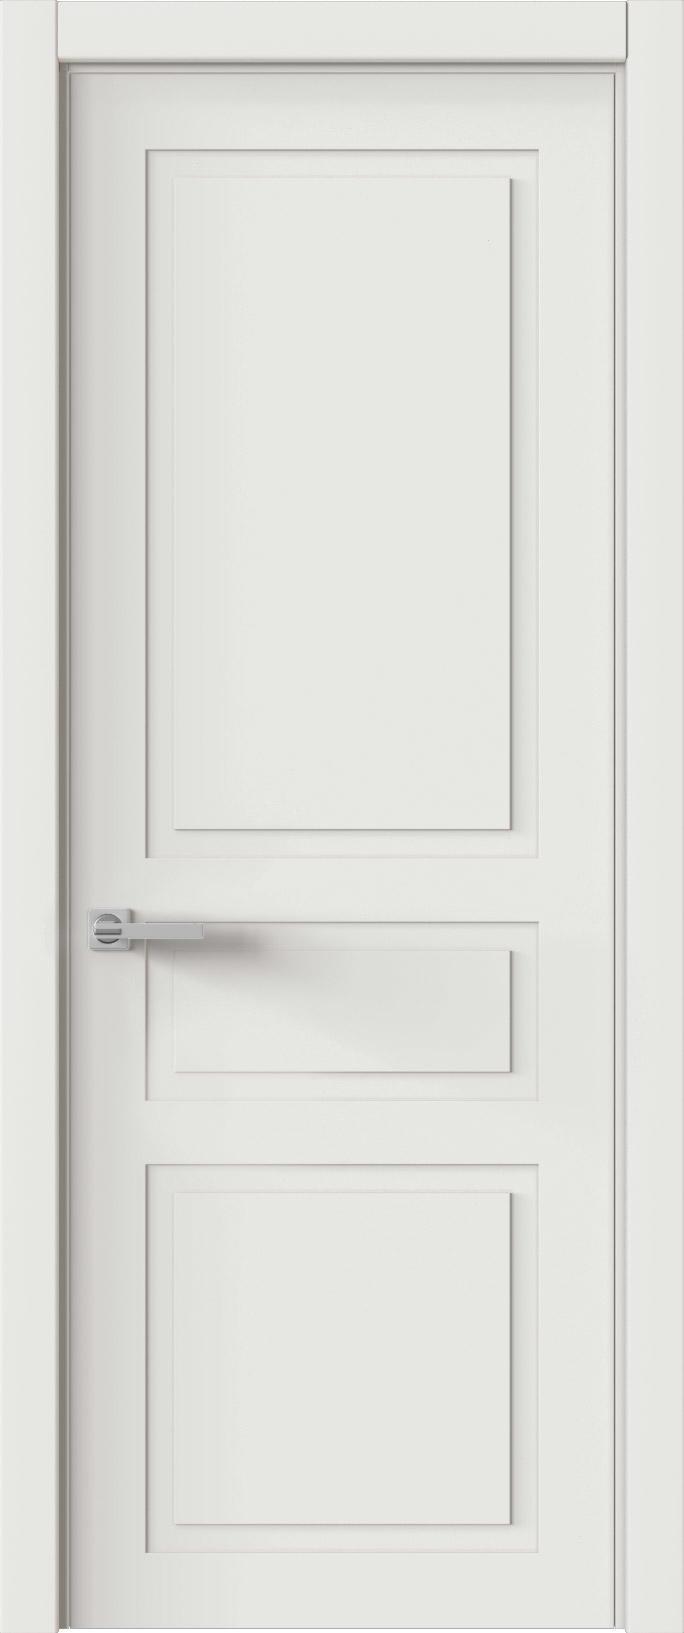 Tivoli Е-5 цвет - Белая эмаль (RAL 9003) Без стекла (ДГ)